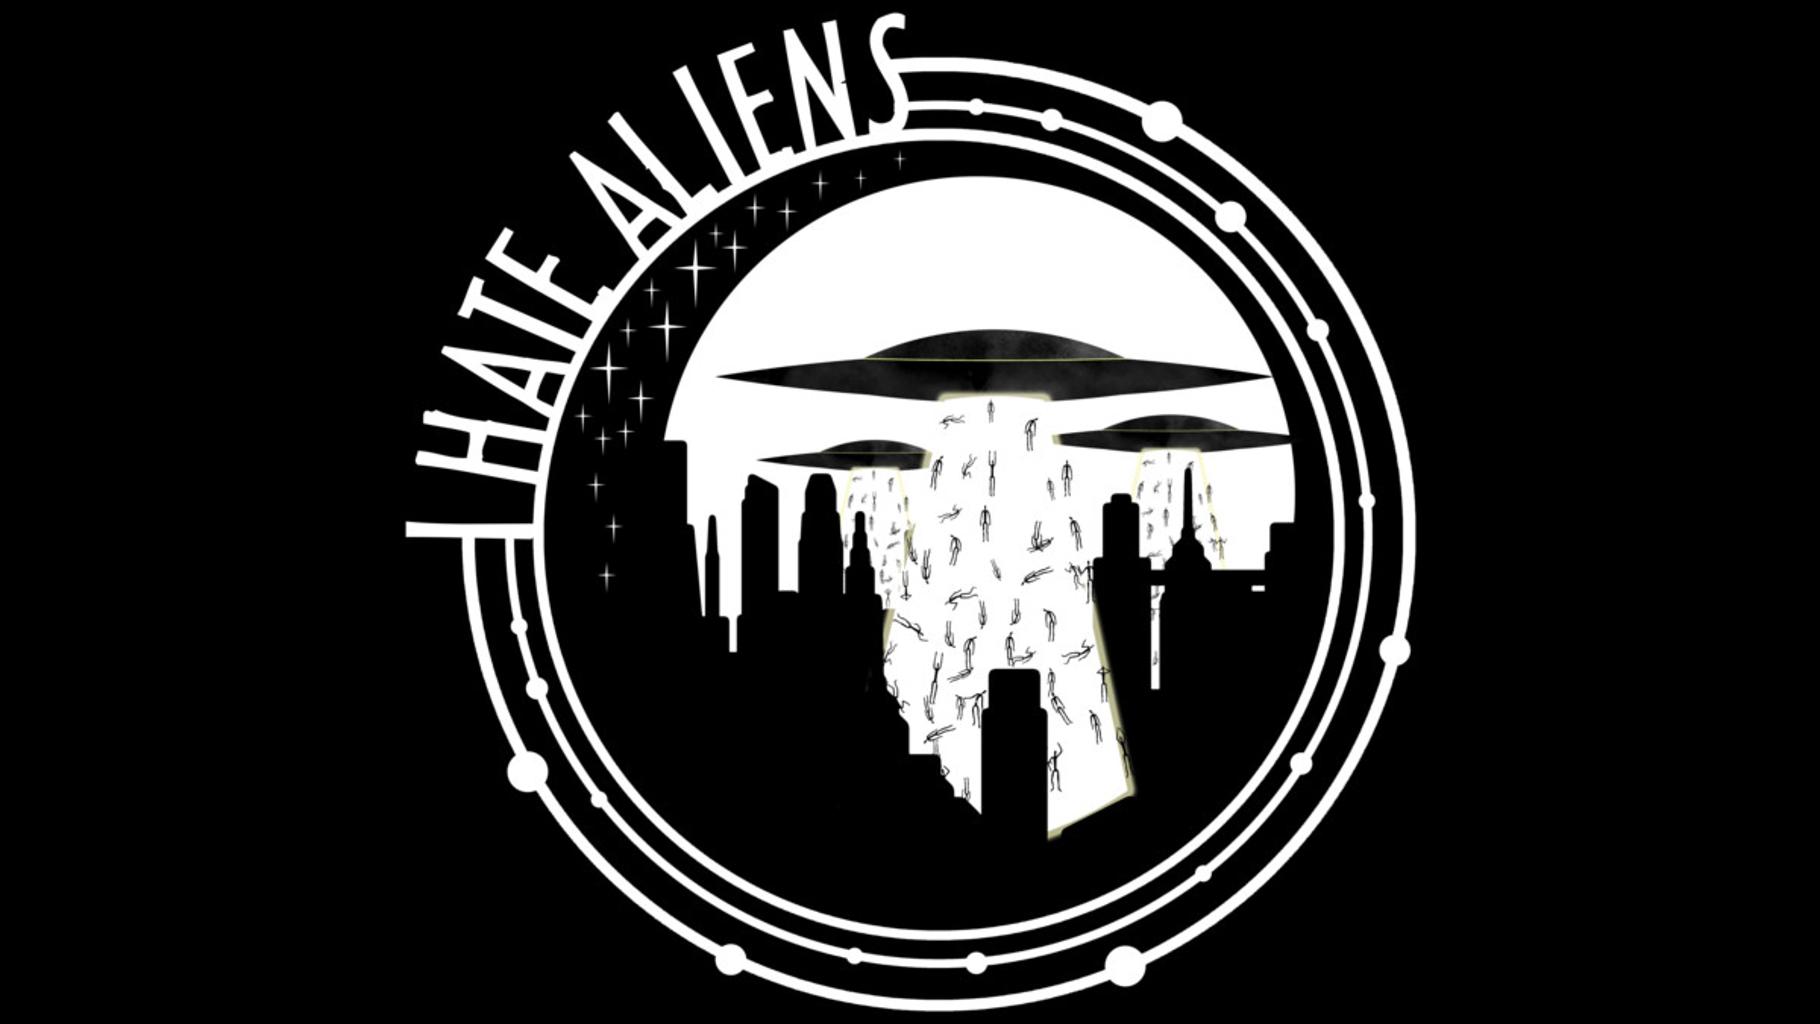 Design by Humans: Aliens Love